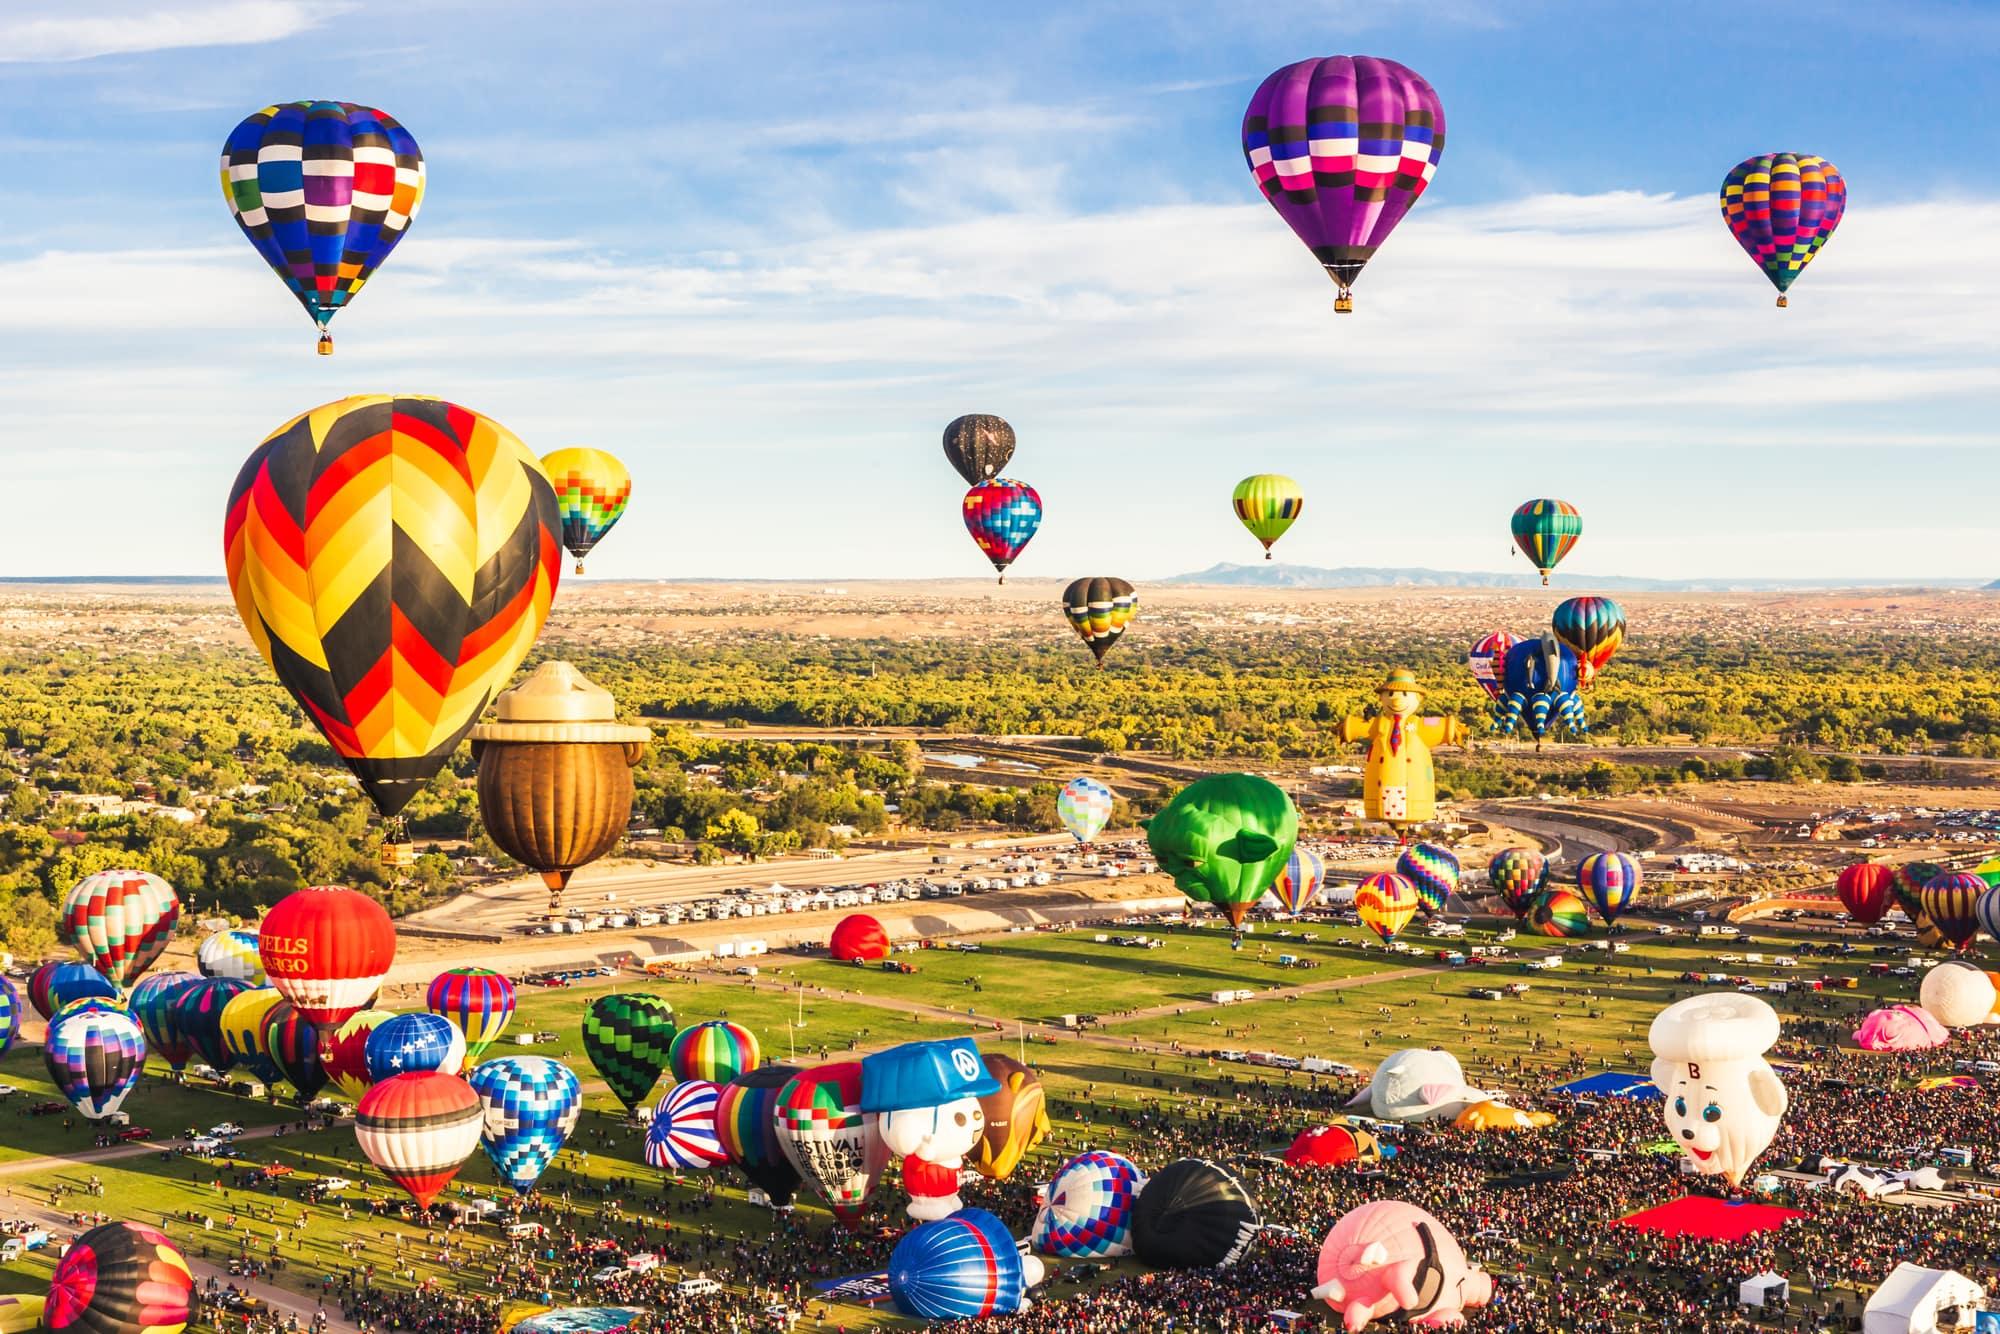 Albuquerque Balloon Fiesta ©Leora Bermeister